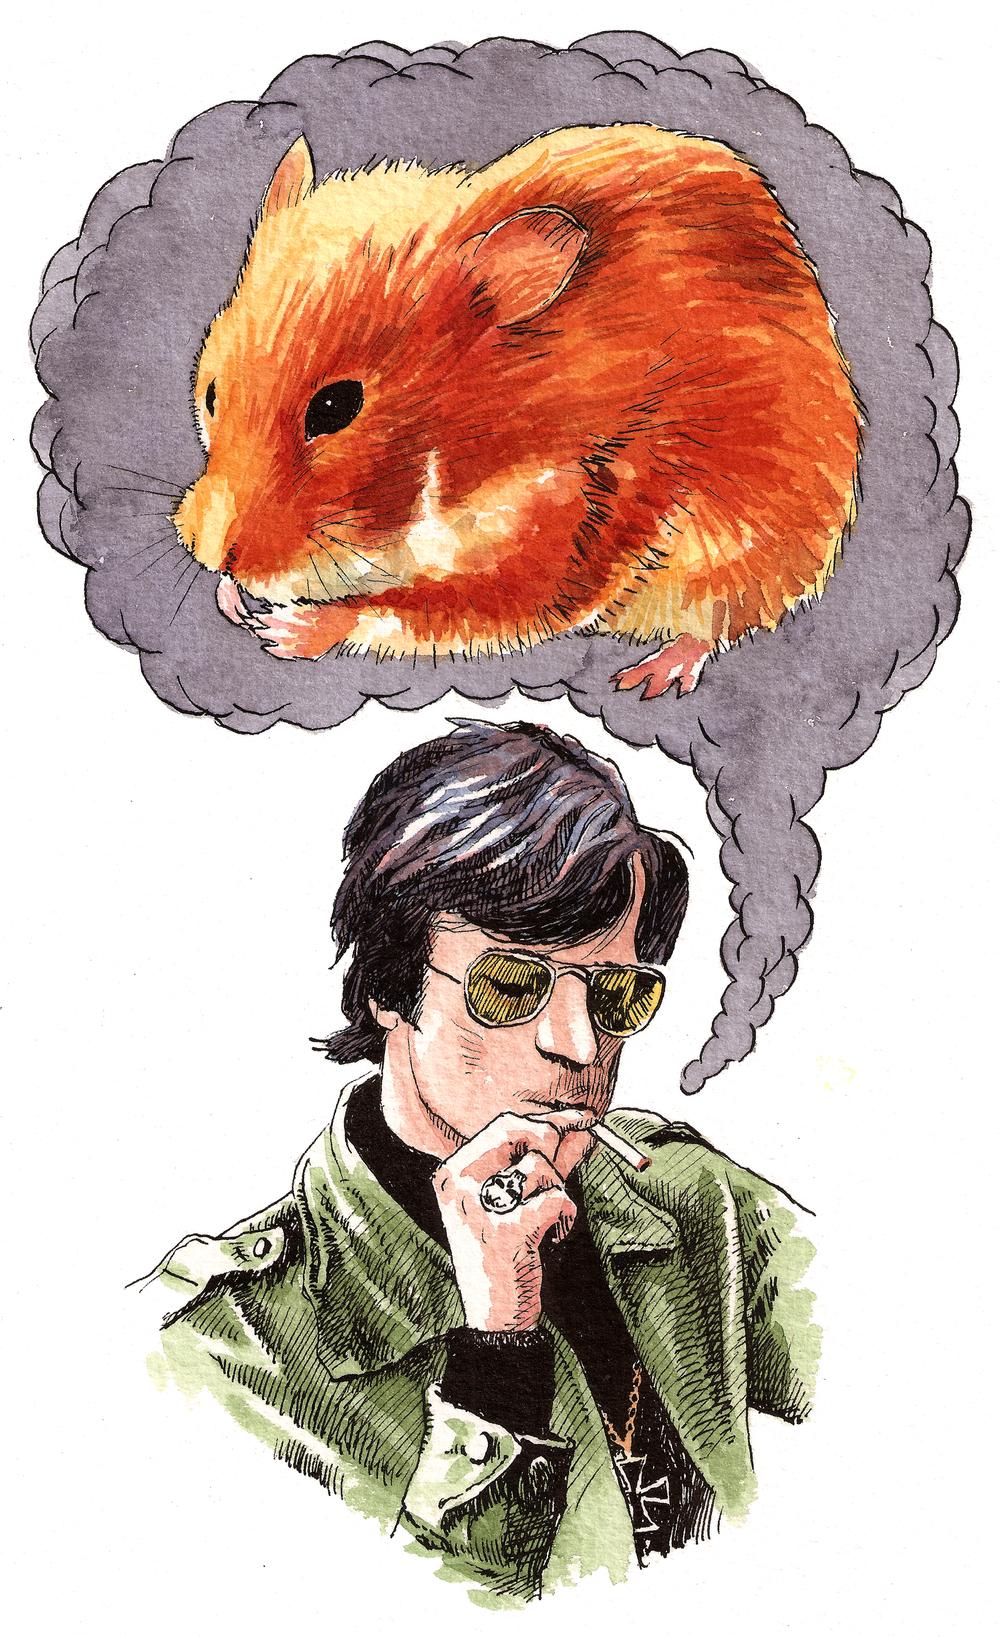 'The Smoker'